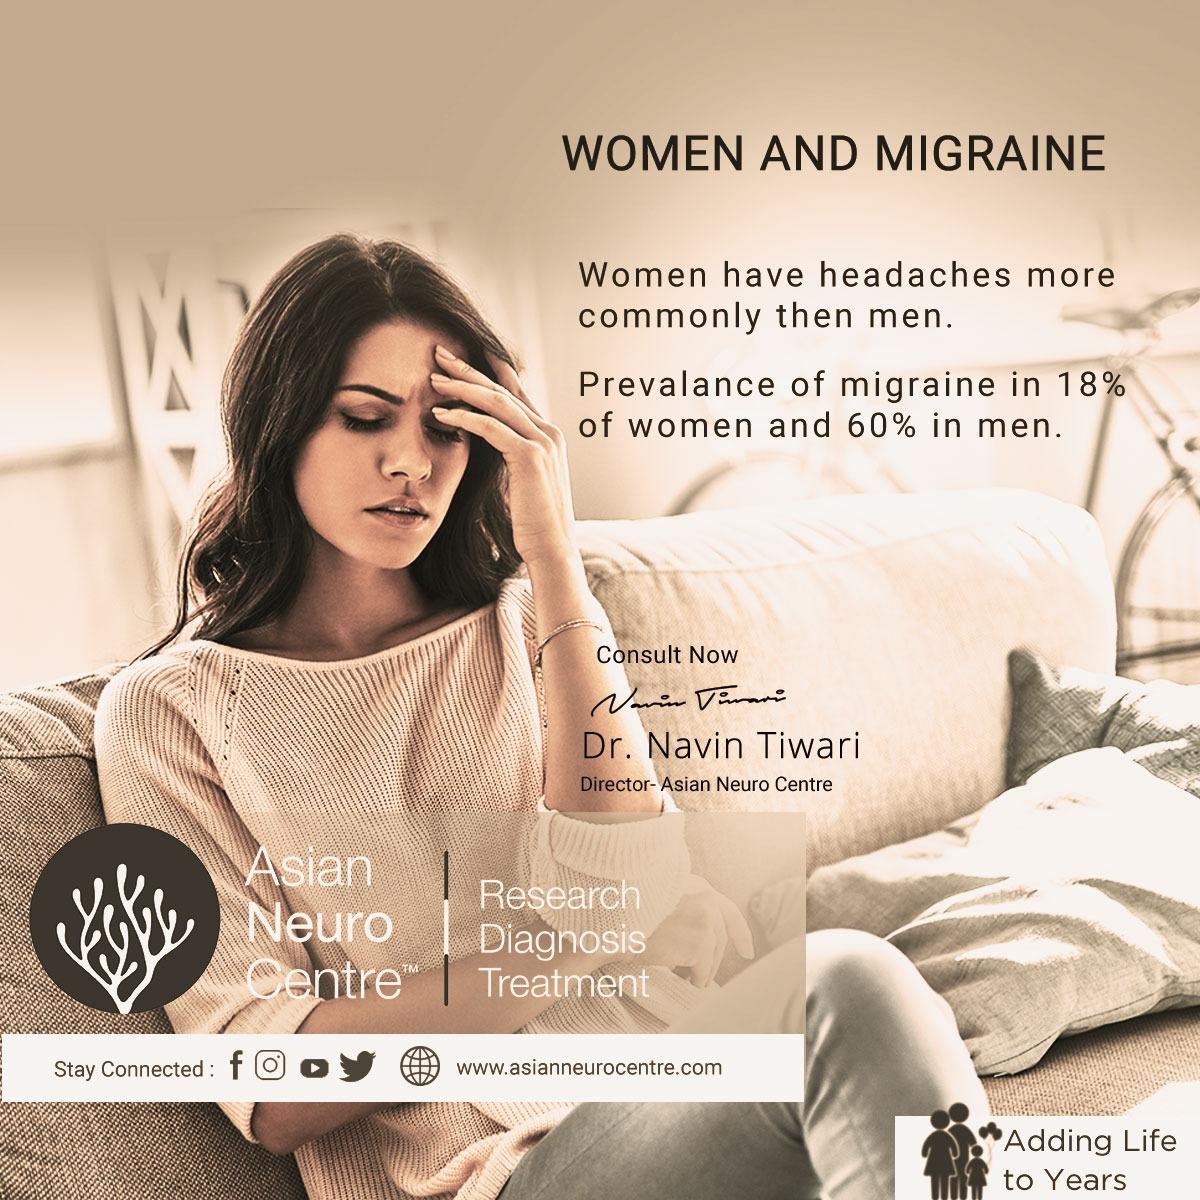 Best Migraine Treatment For Women Indore - Dr. Navin Tiwari